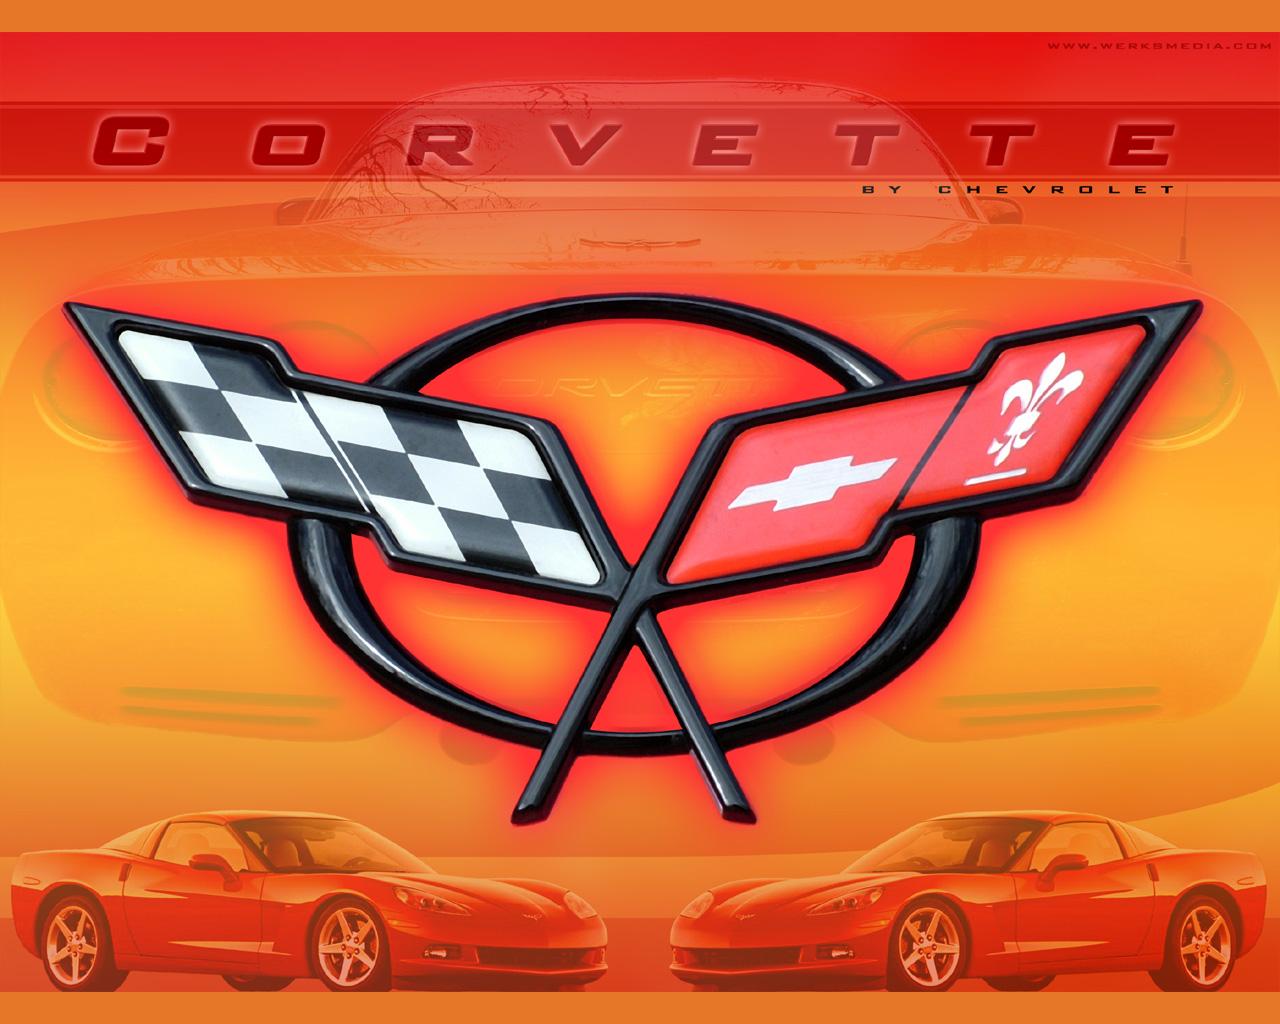 corvette logo wallpaper free desktop wallpaper - Corvette C5 Logo Wallpaper